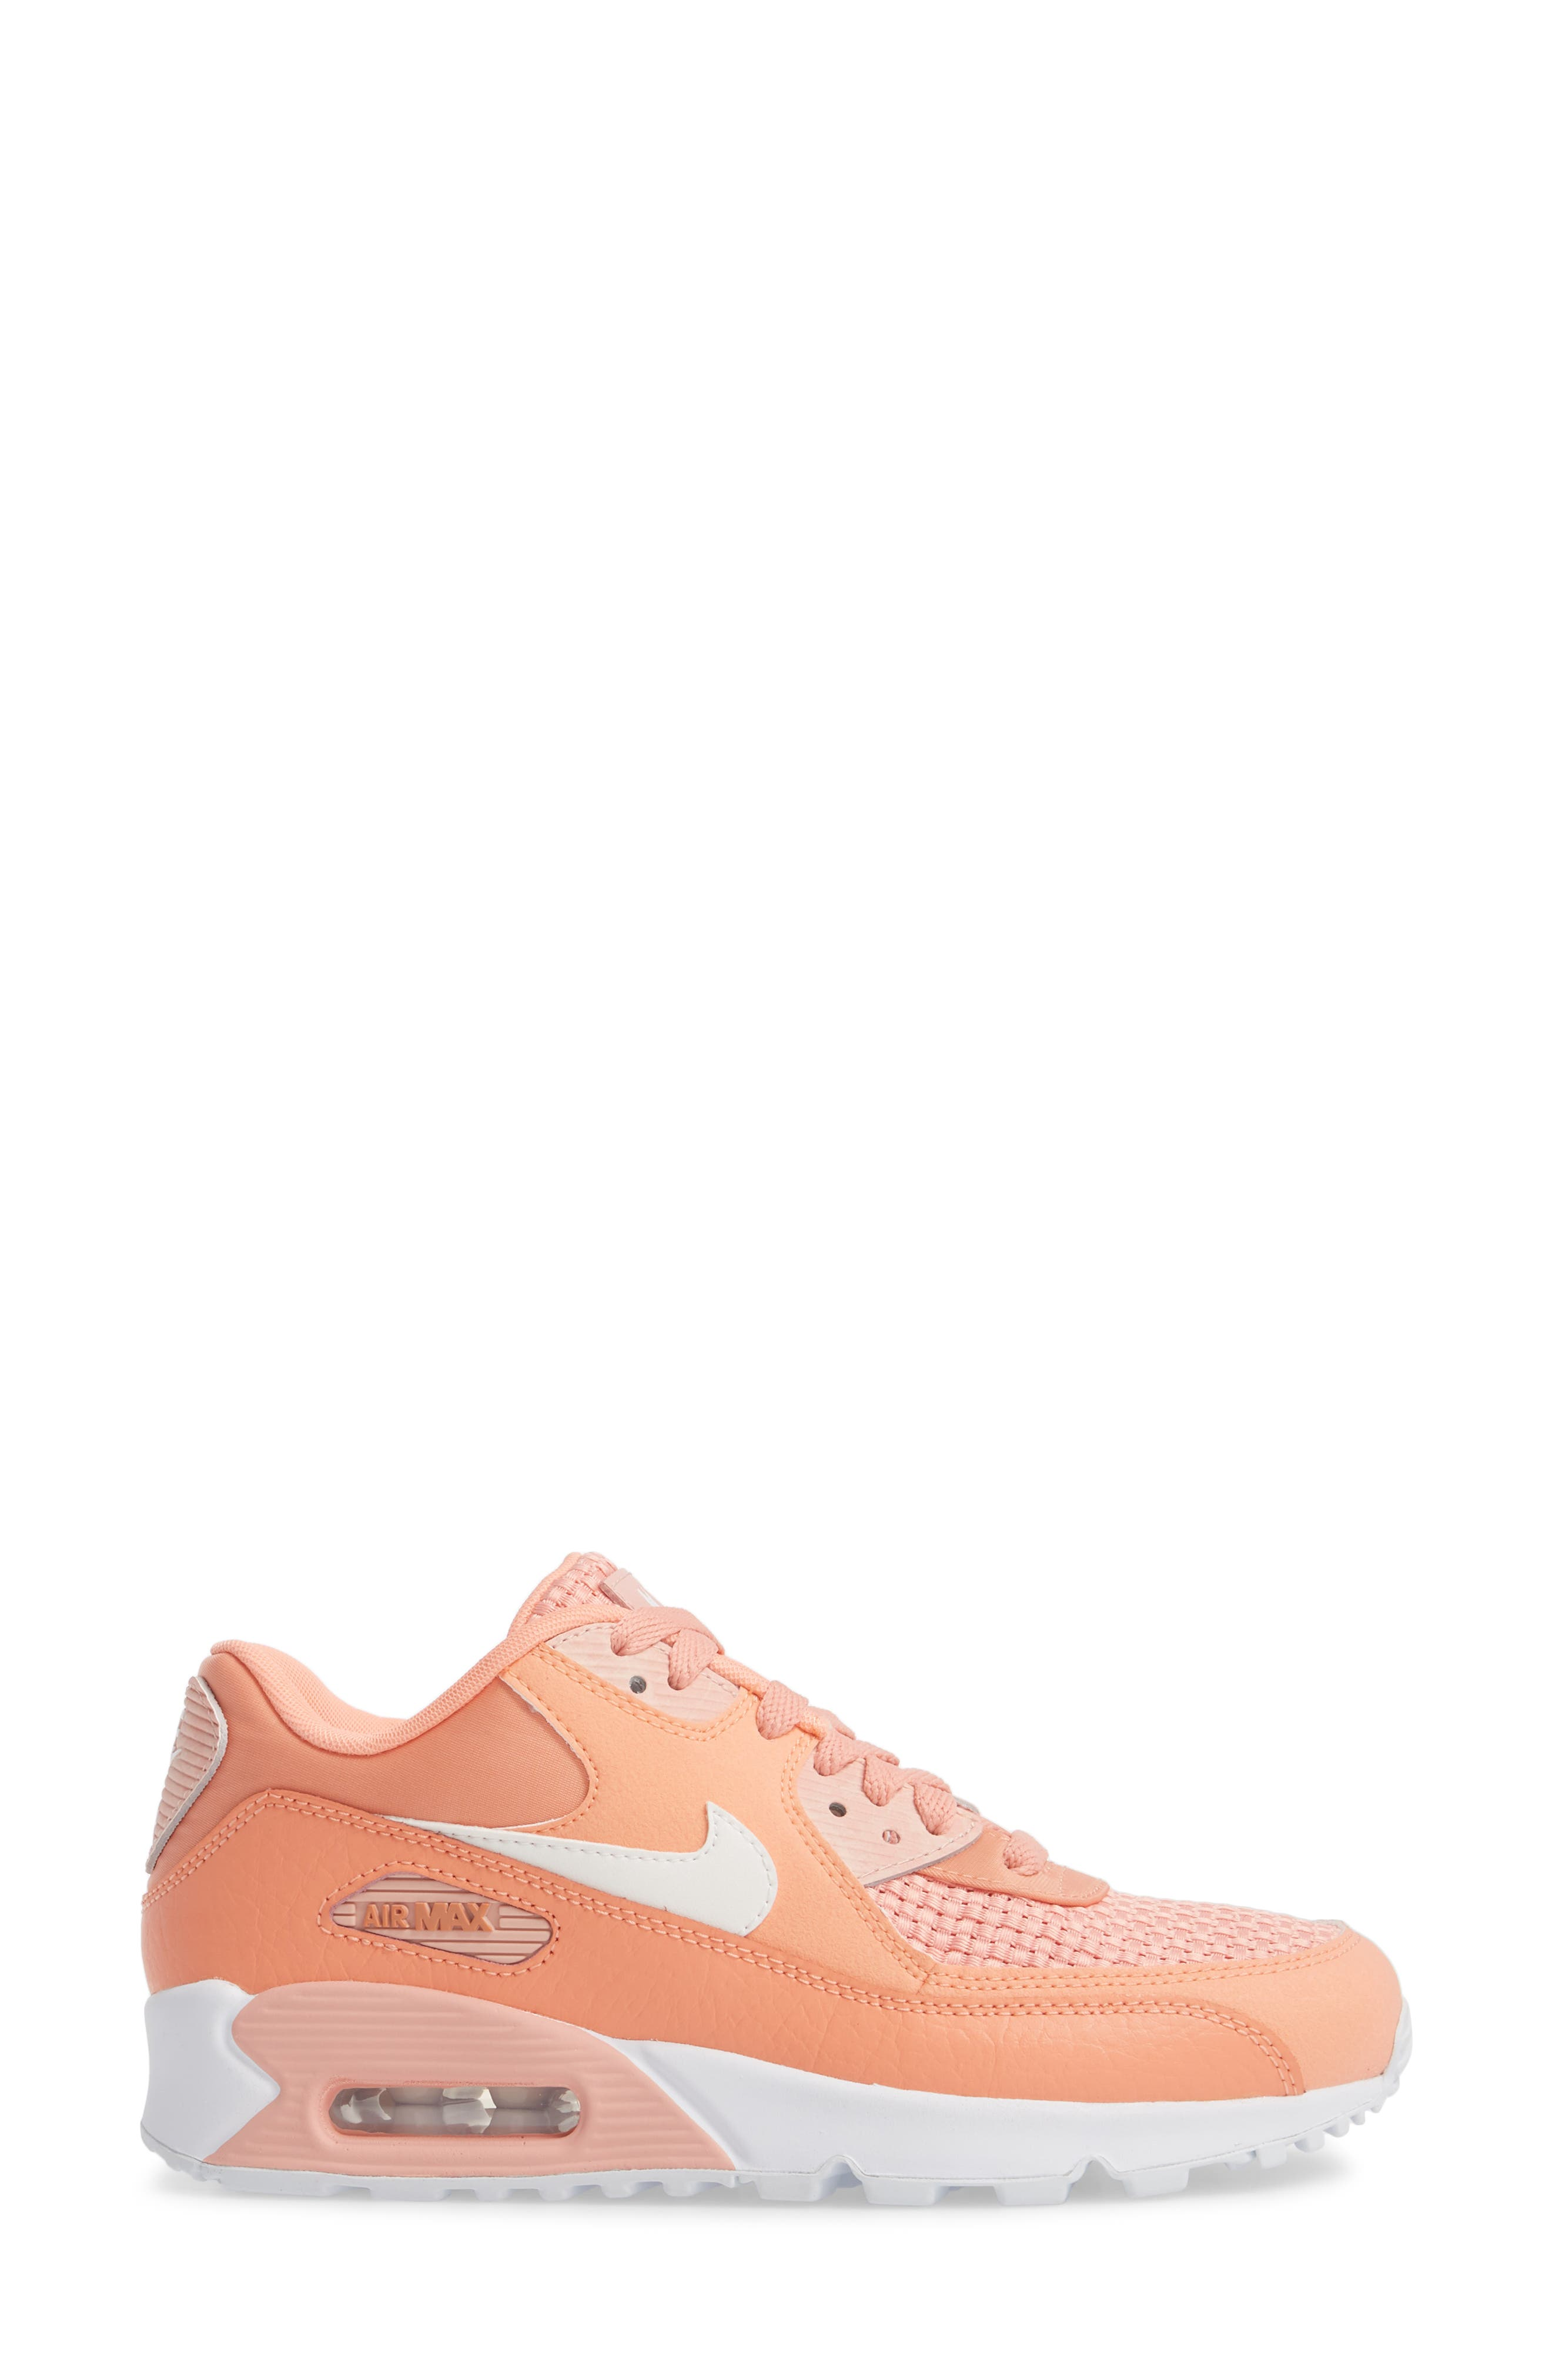 Air Max 90 SE Sneaker,                             Alternate thumbnail 21, color,